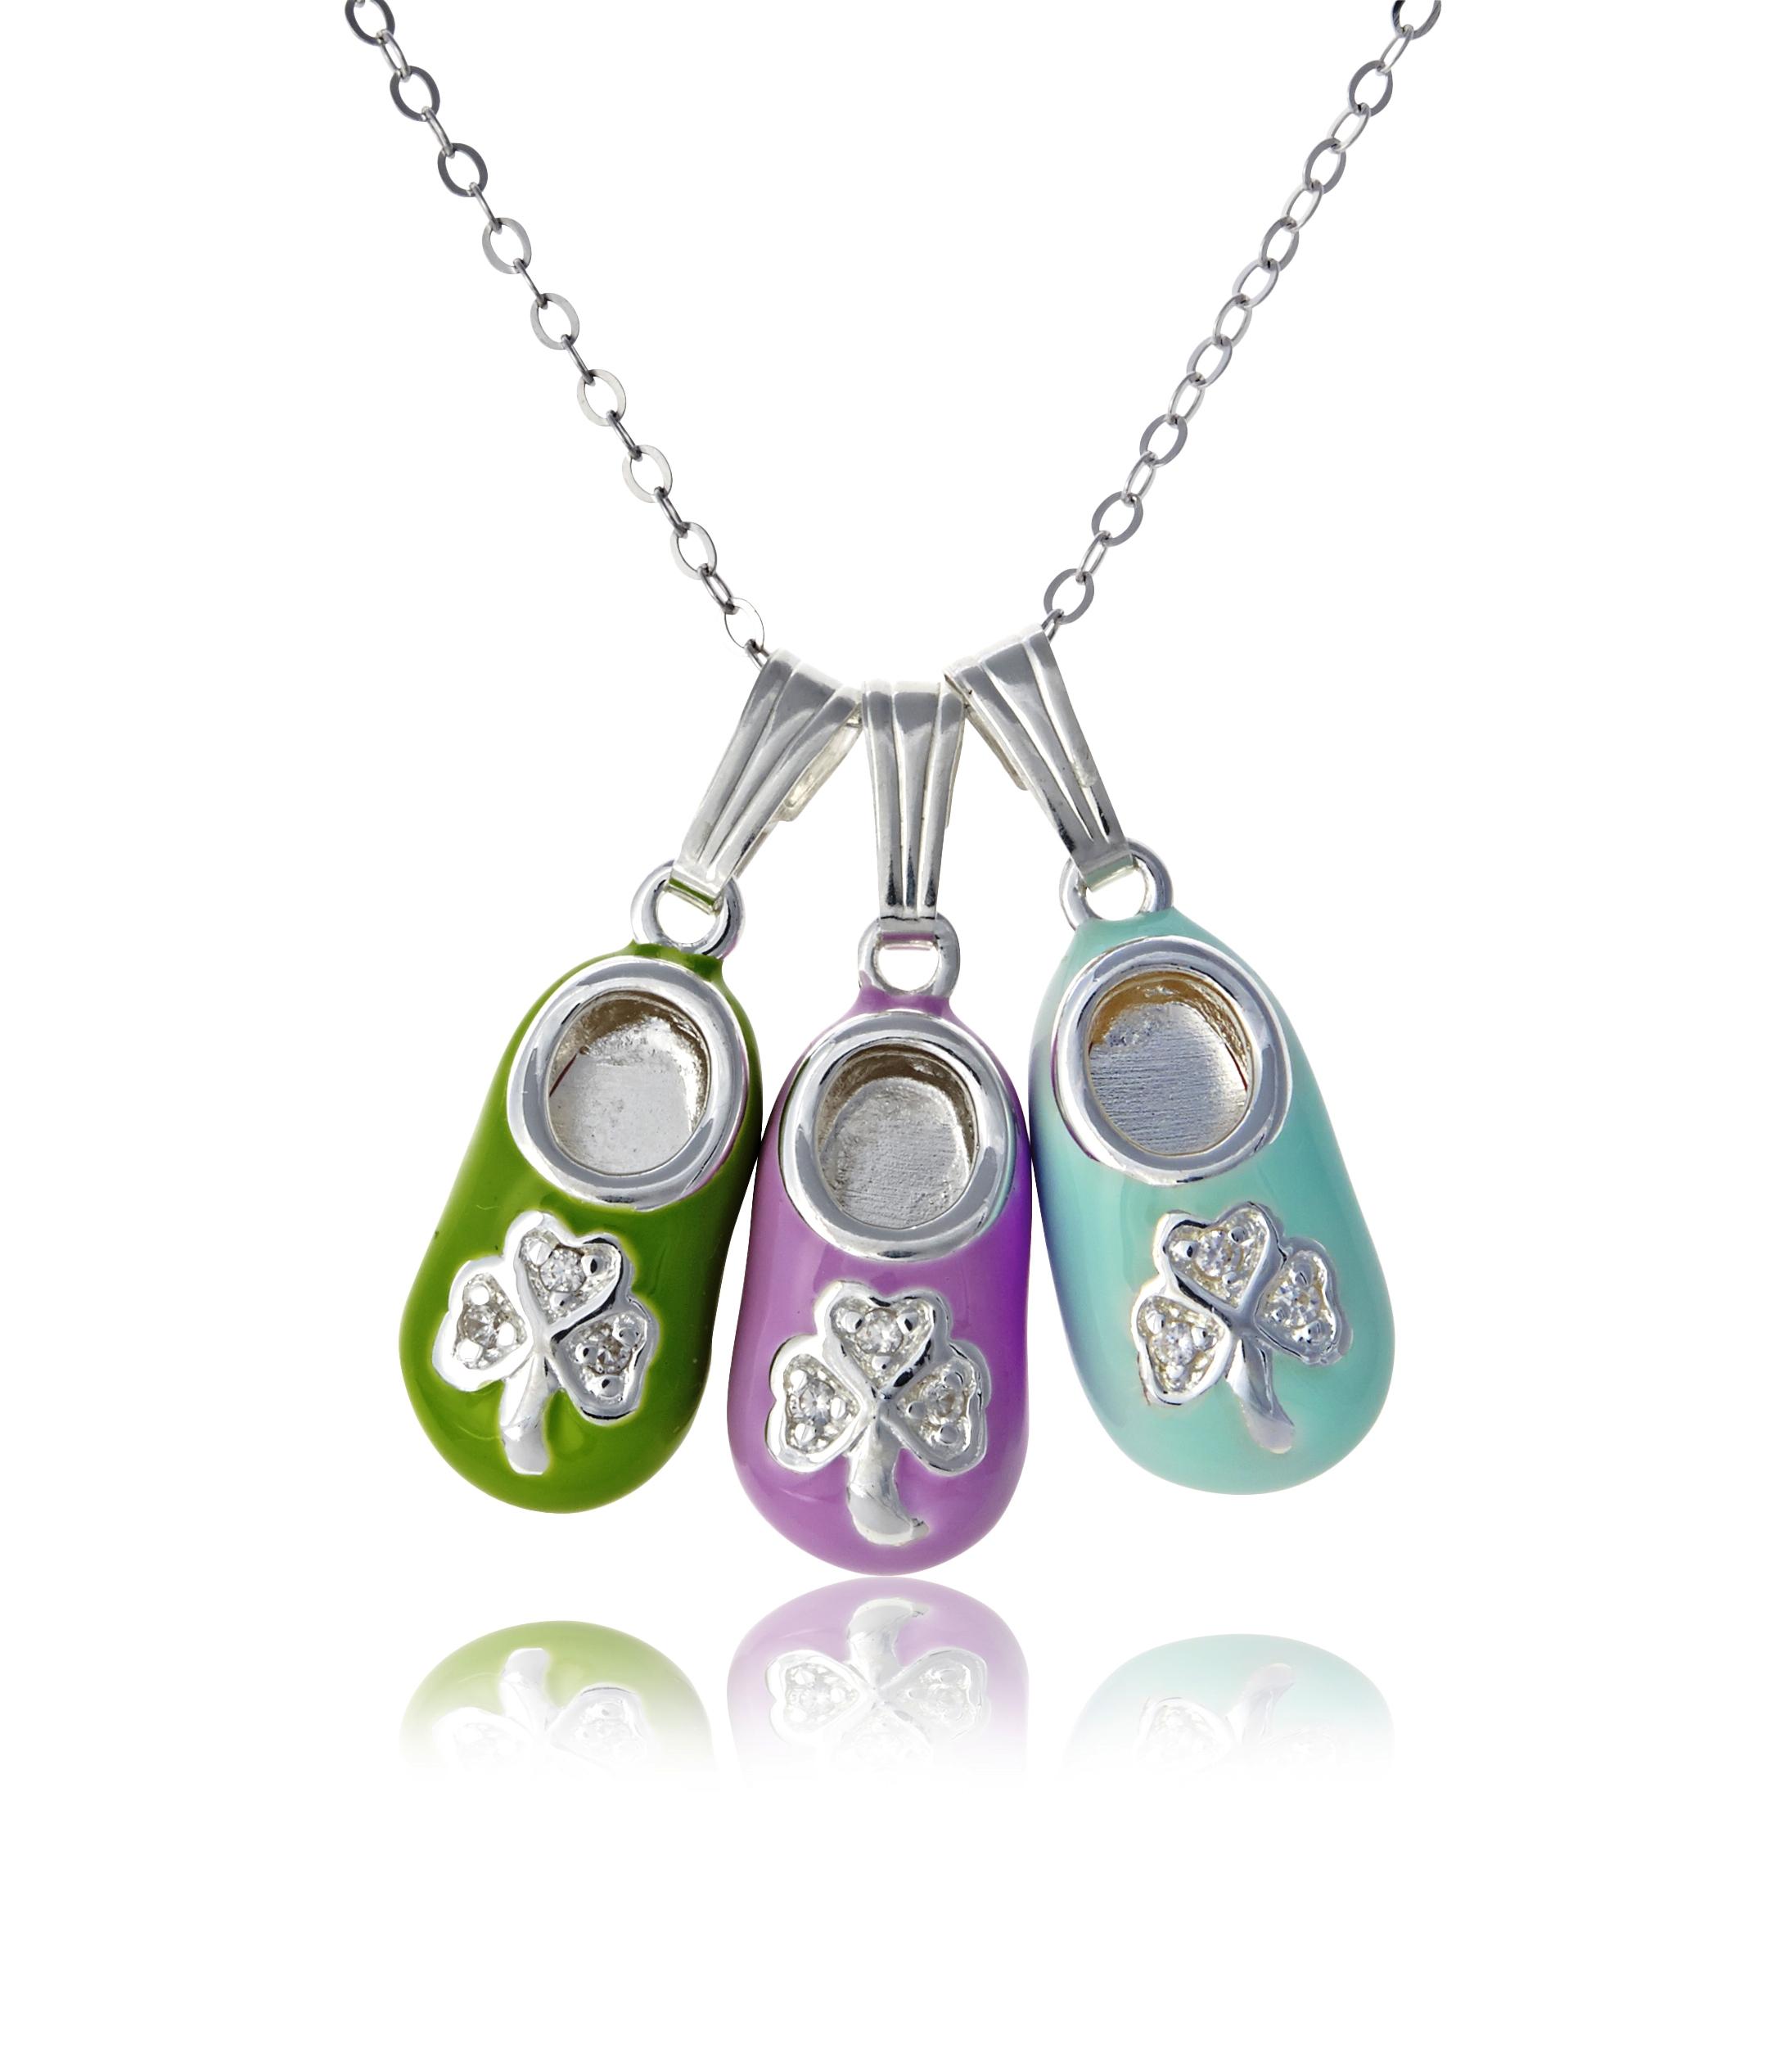 Irish Baby Bootie Necklace And Irish Motherhood Jewelry